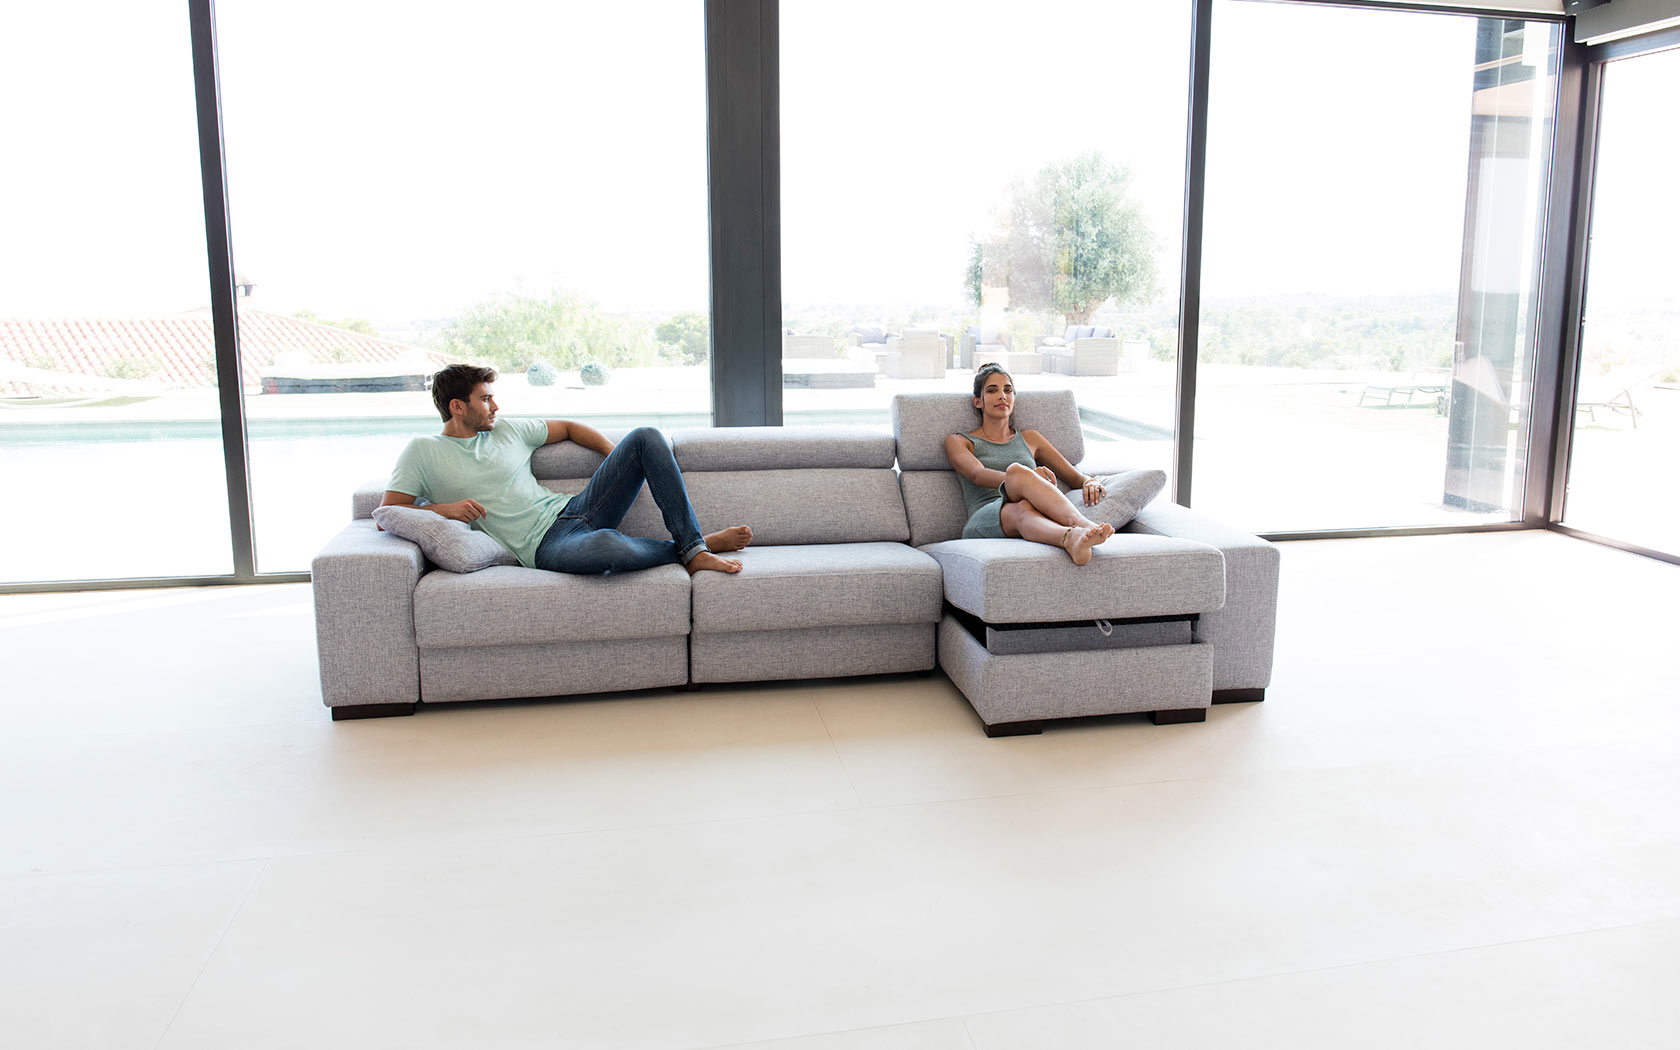 Loto sofá Relax 2019 02